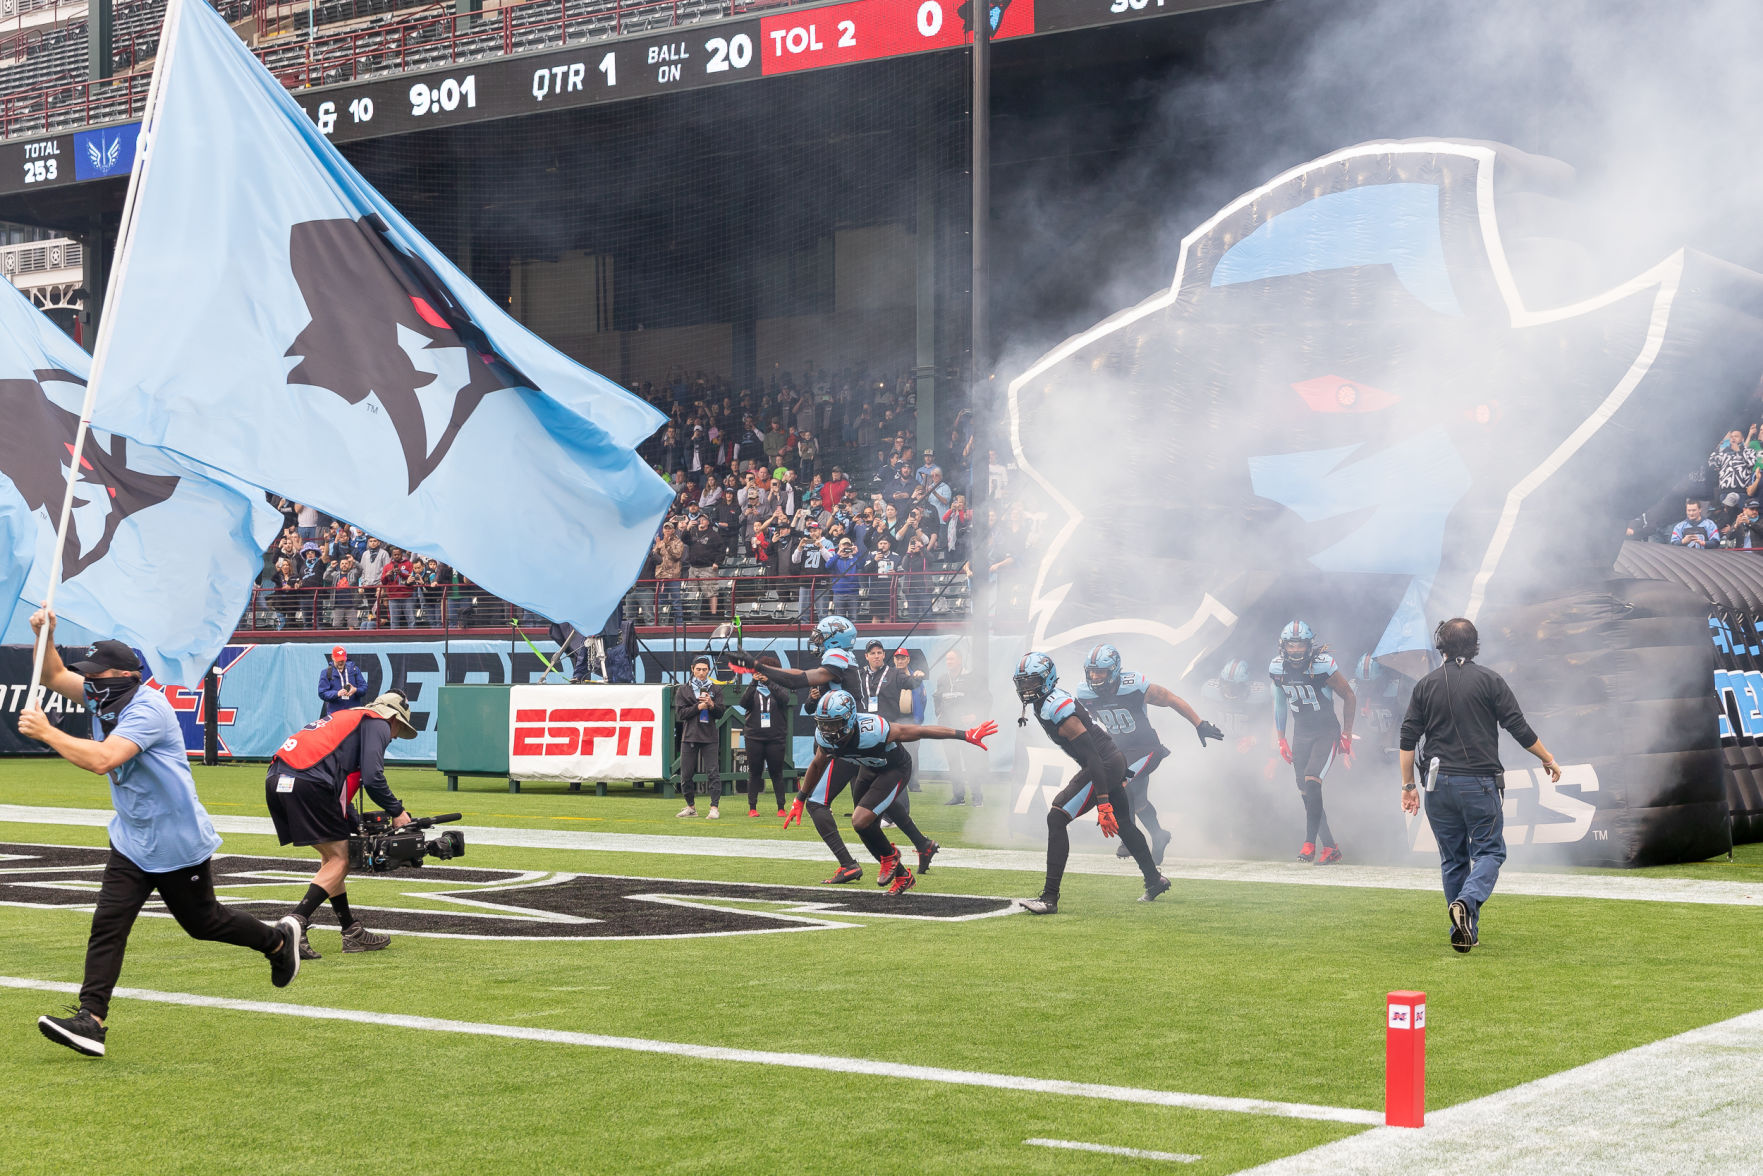 Photos: Dallas Renegades fall to St. Louis BattleHawks in their inaugural game at Globe Life Park